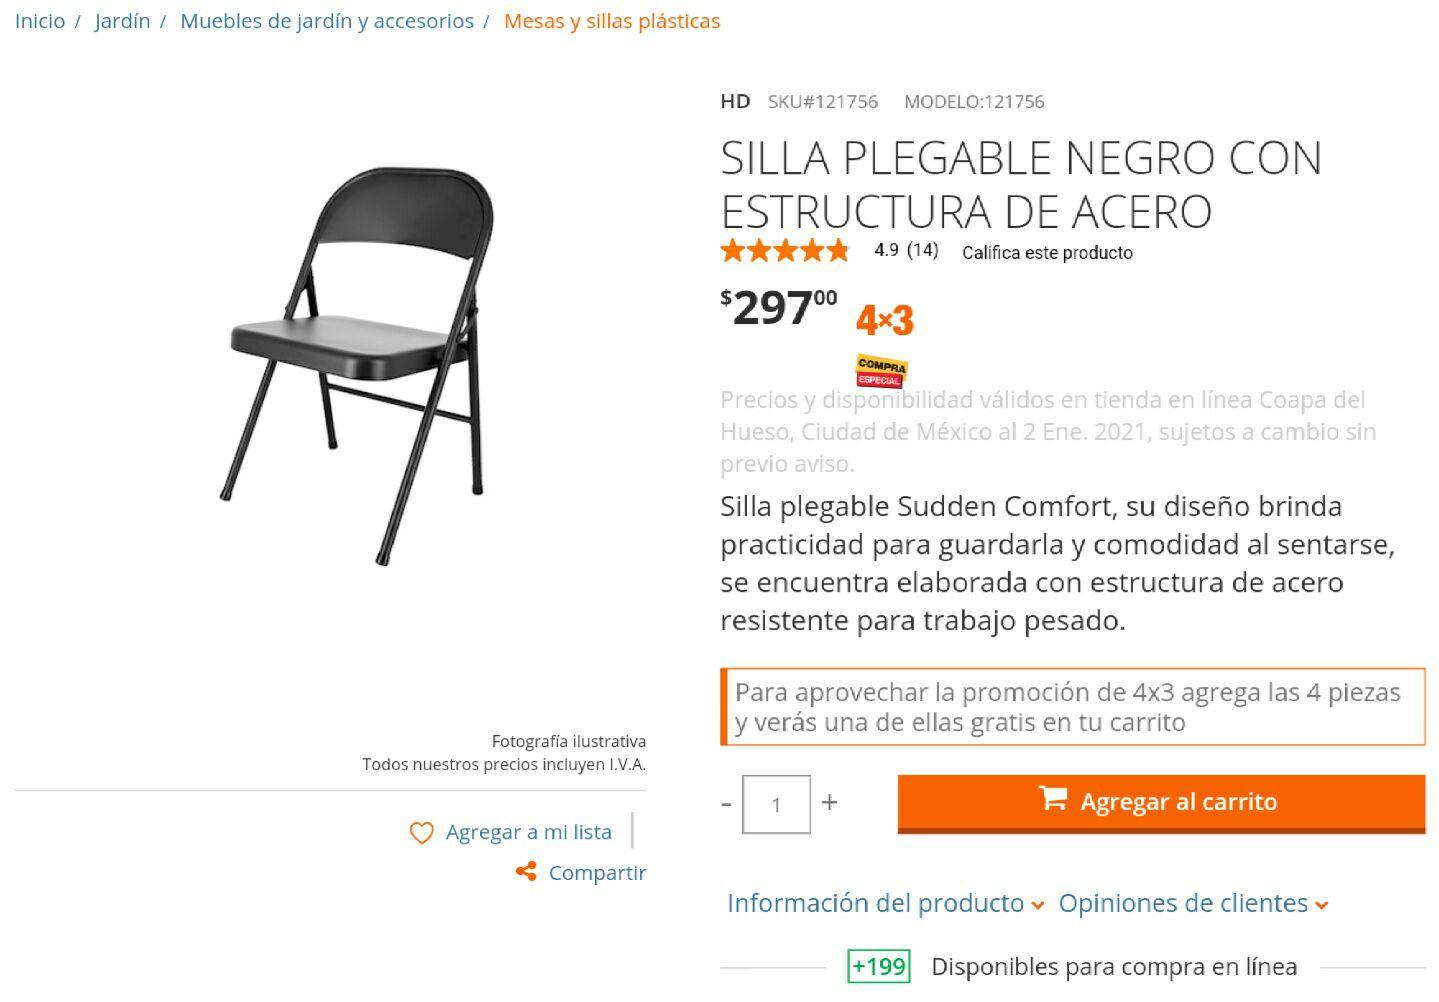 Home Depot, 4 SILLAS PLEGABLE NEGRO CON ESTRUCTURA DE ACERO